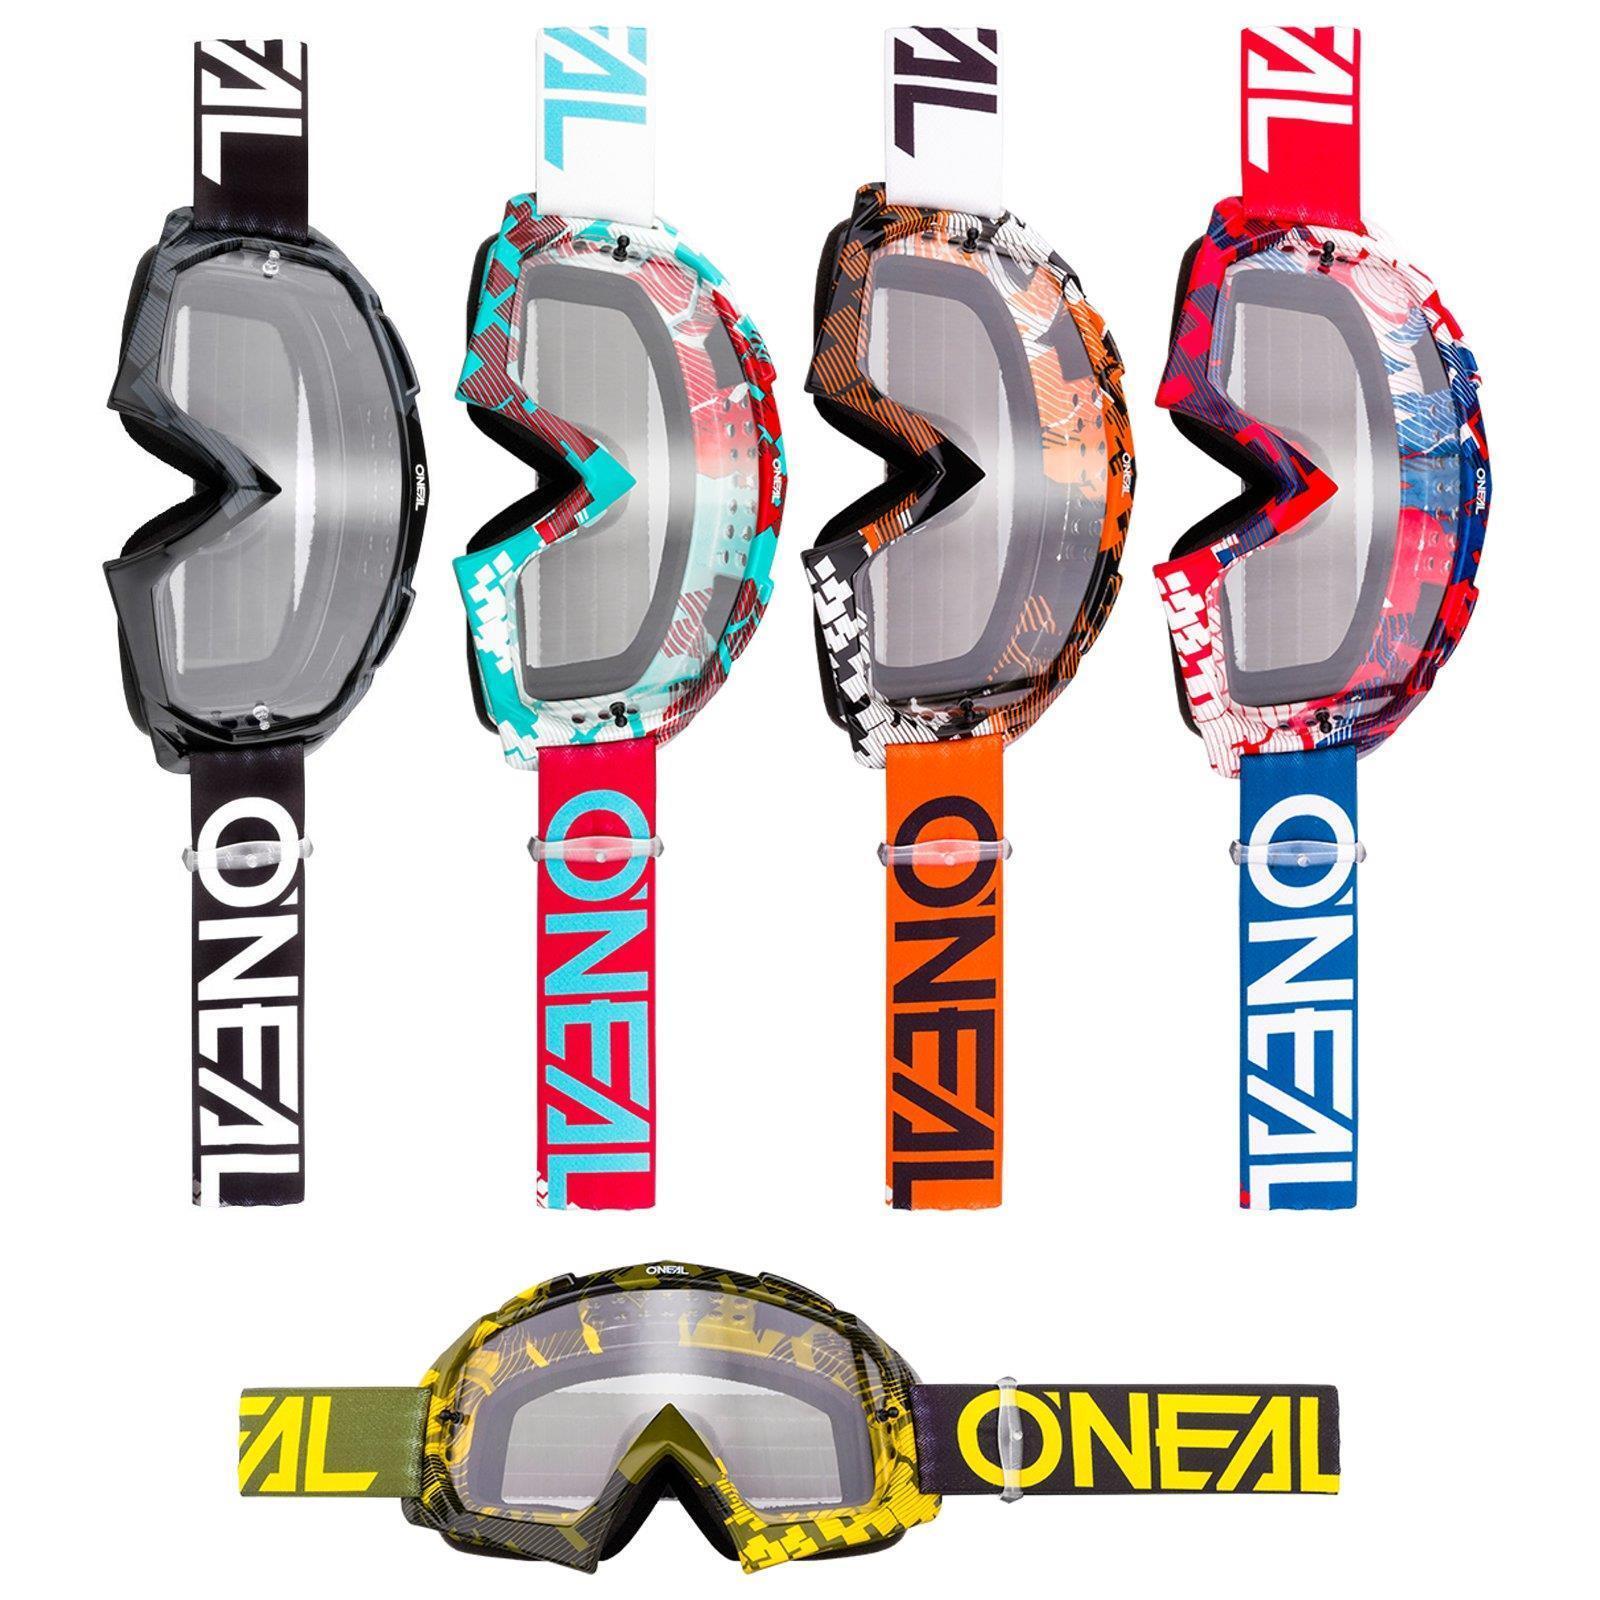 ONeal B-10 Goggle Pixel MX Brille Klar Moto Cross  Downhill AntiFog Mountainbike  various sizes